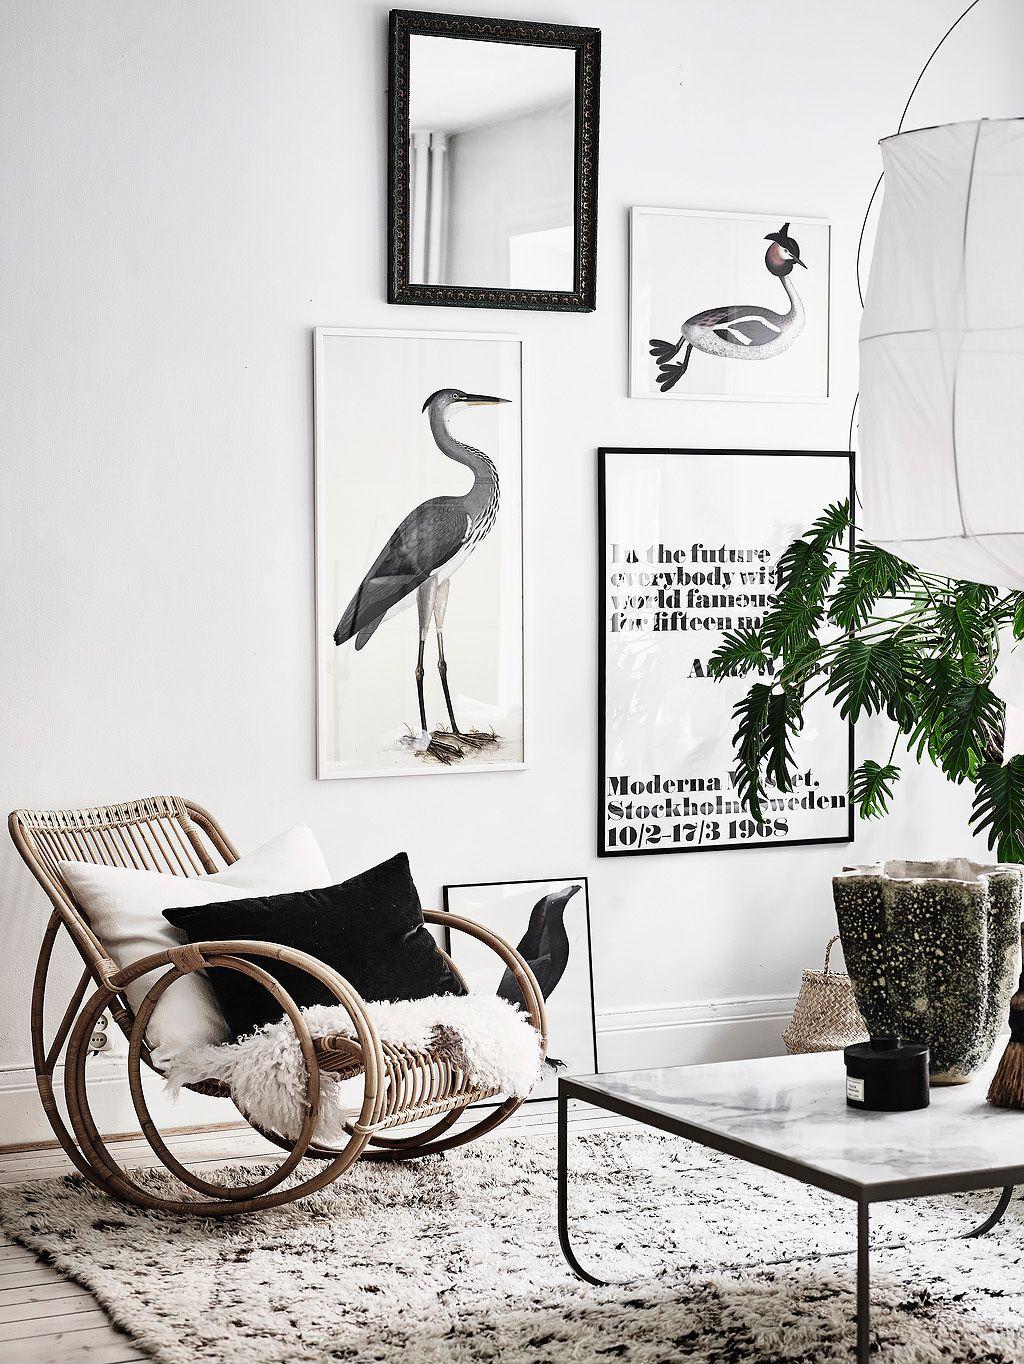 Pin by Carolina Bergman on Inspiration   Pinterest   Rattan ...